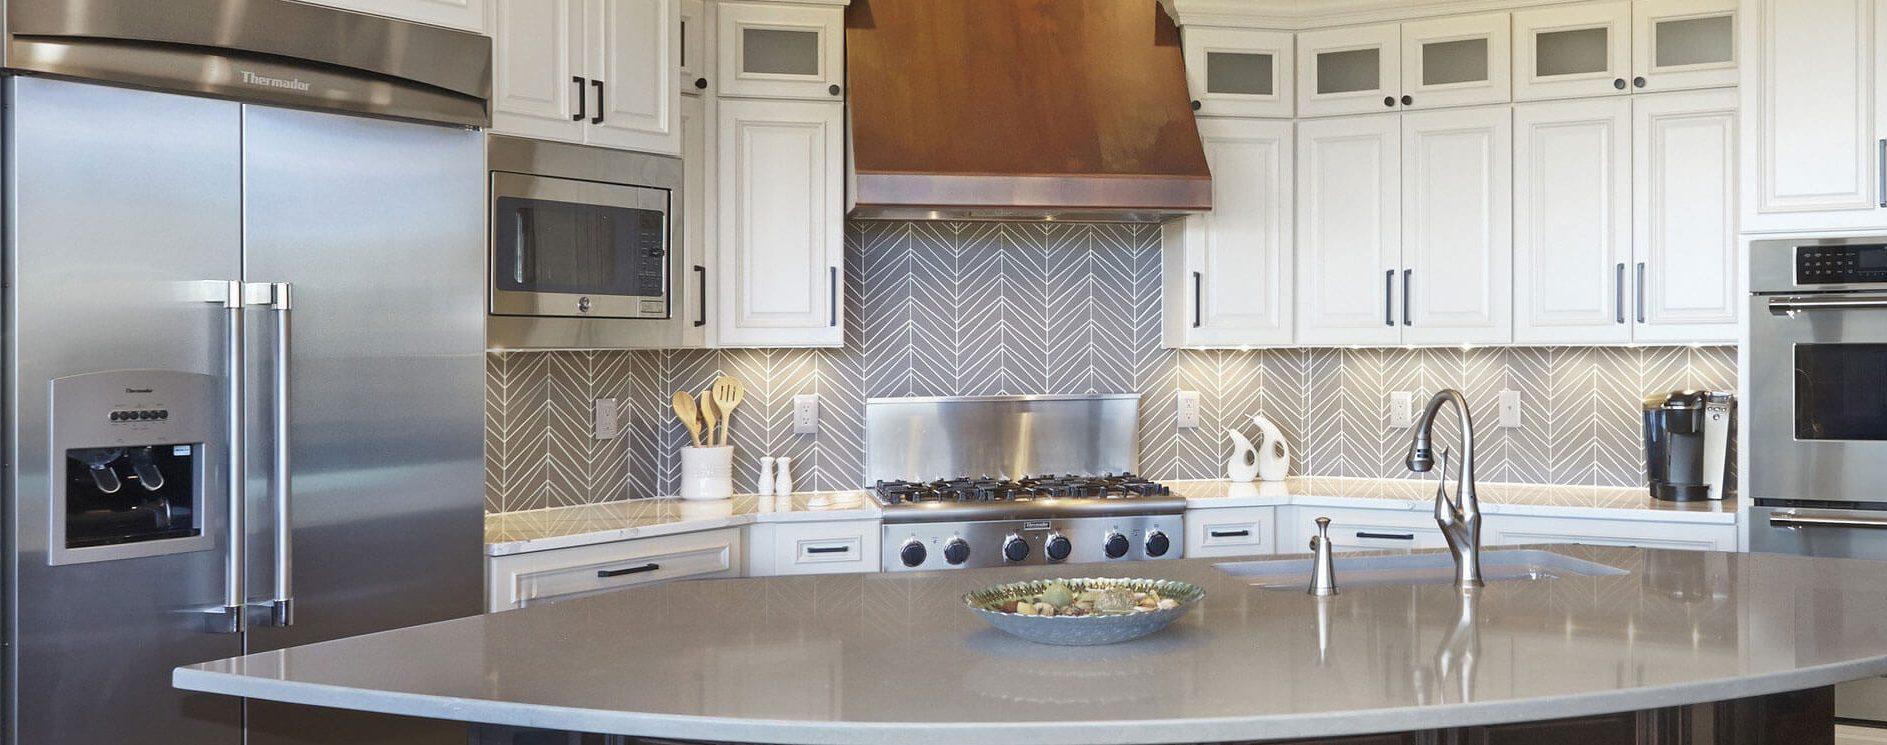 eren design remodel tucson az home remodeling contractors